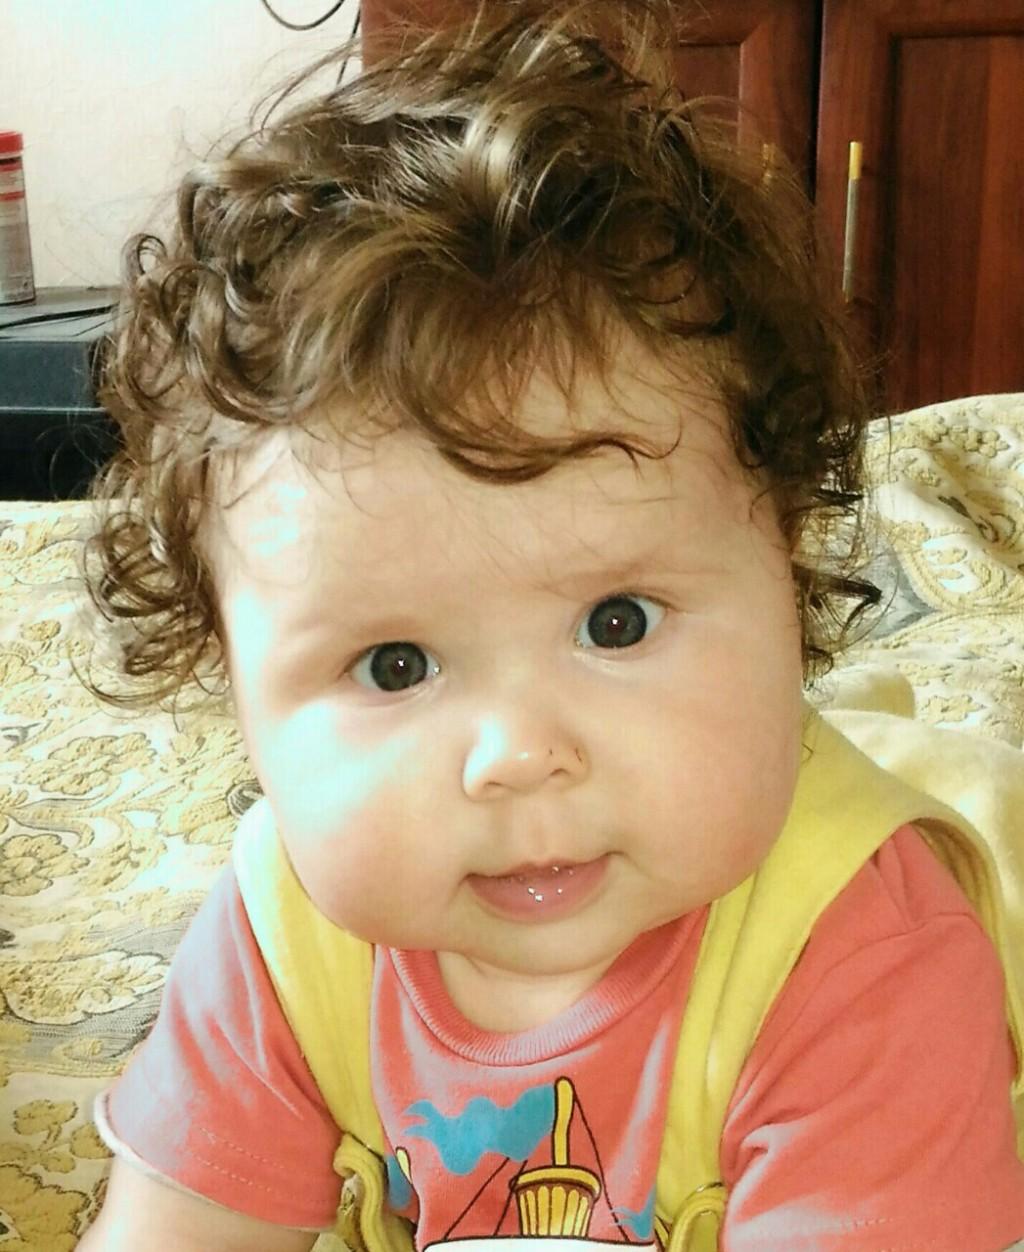 Один глаз меньше другого у ребенка фото